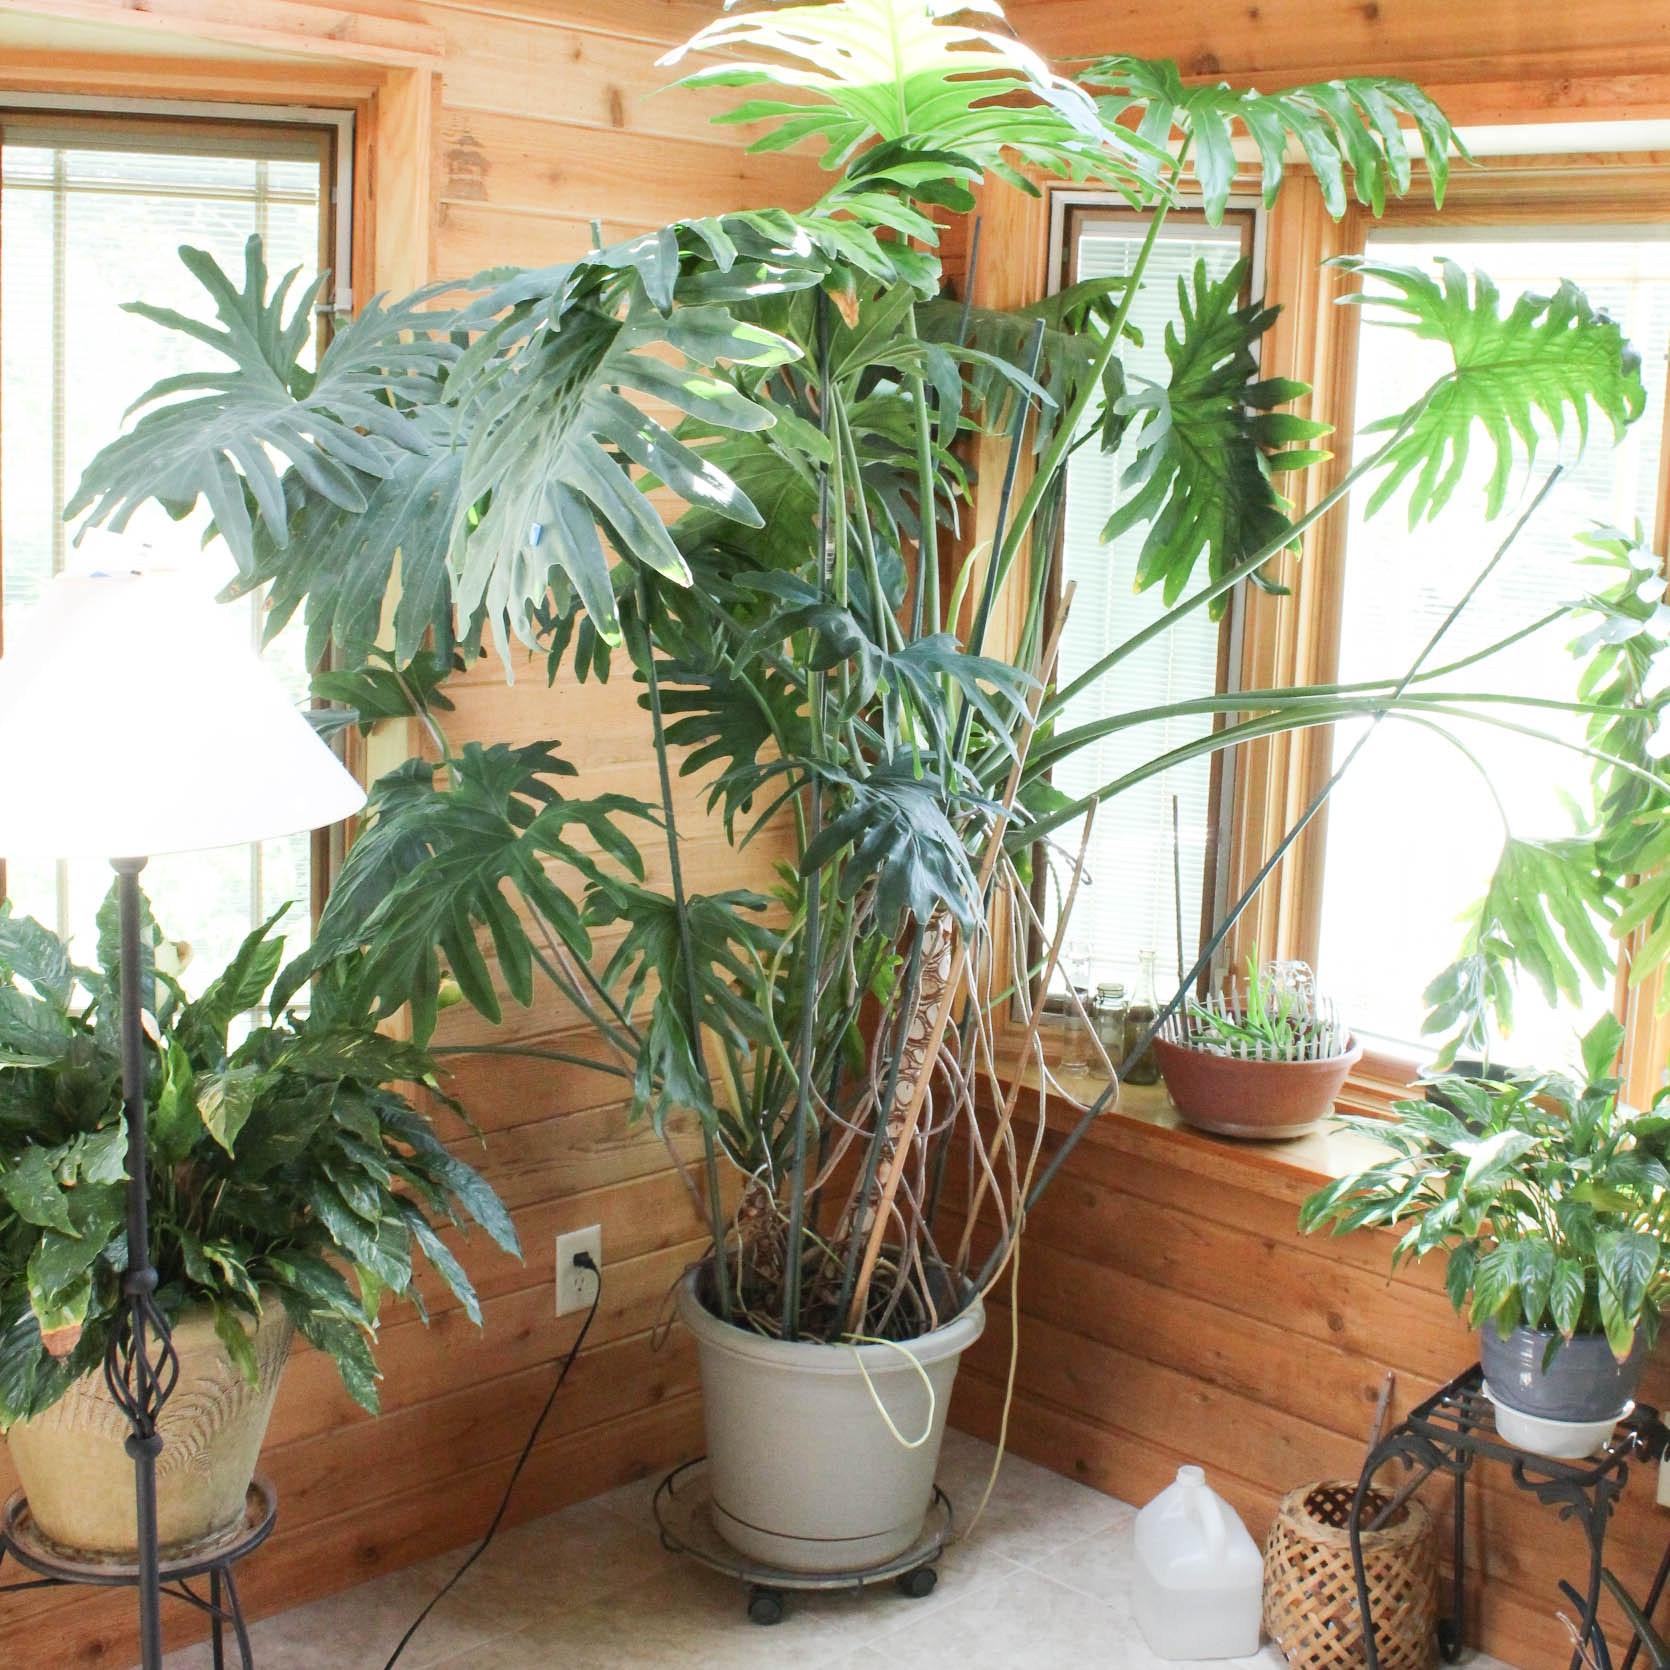 Large Philodendron Bipinnatifidum in Rolling Planter